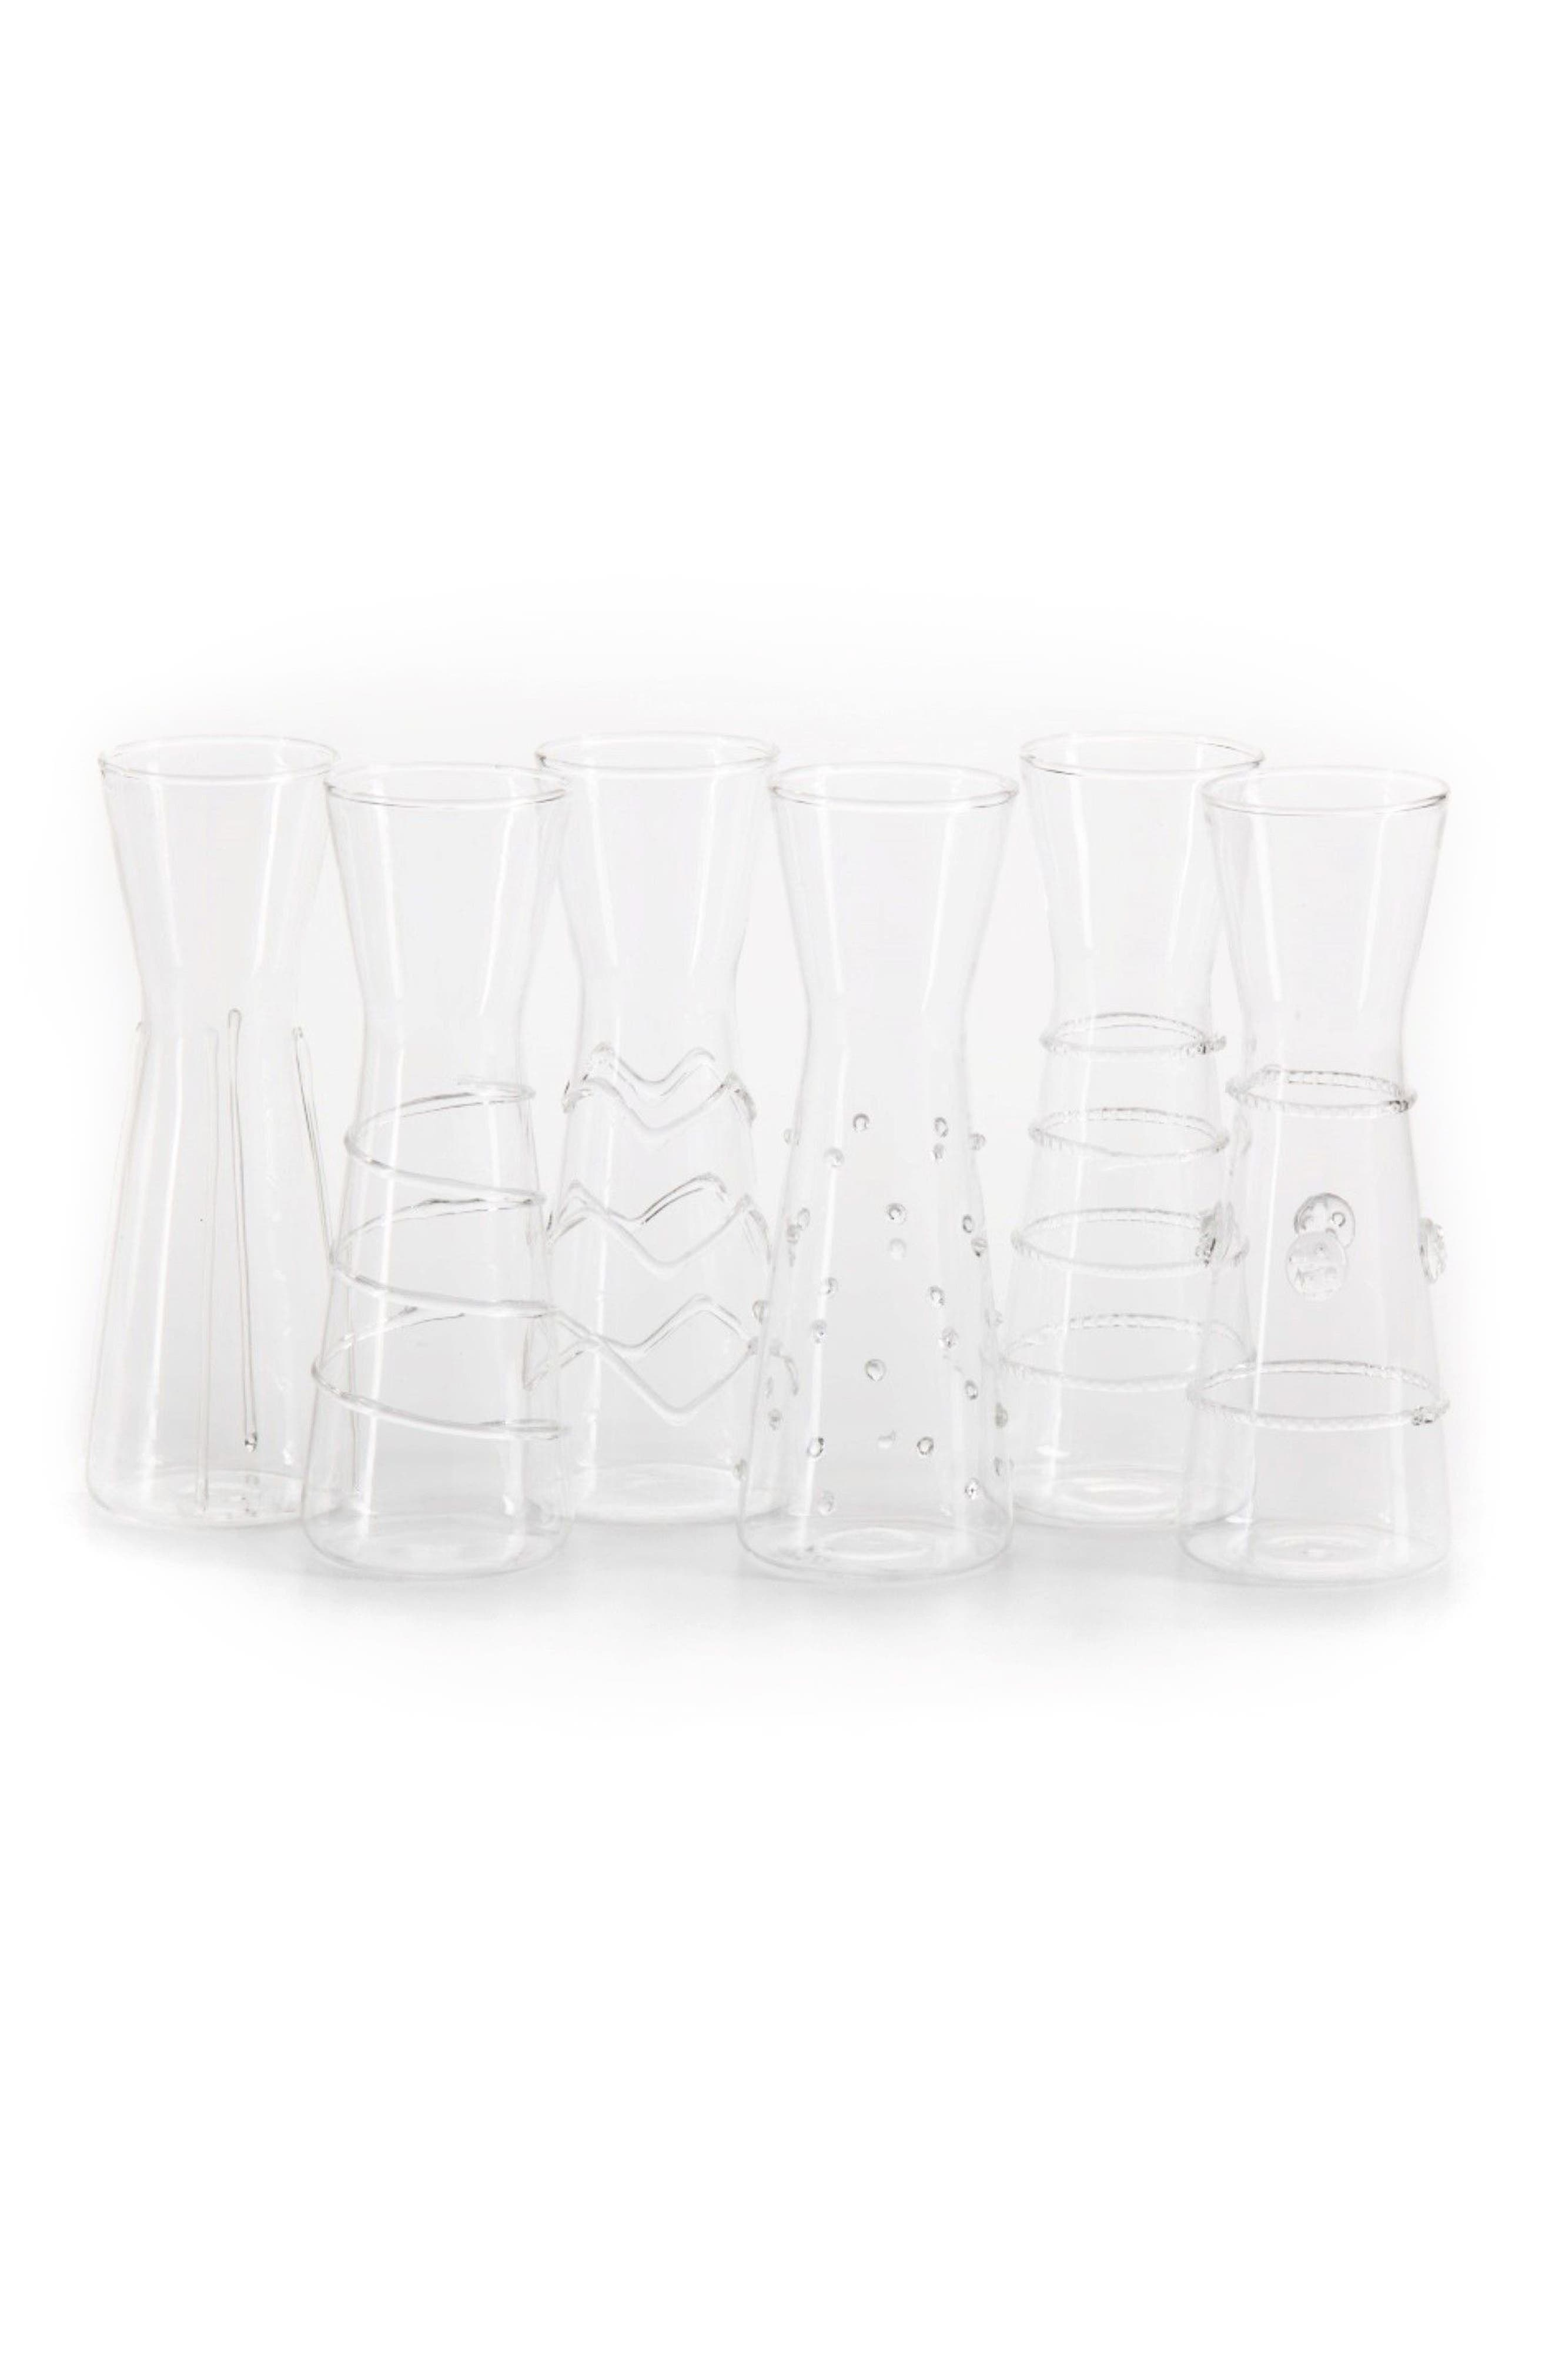 Zalli Set of 6 Glasses,                             Main thumbnail 1, color,                             Clear